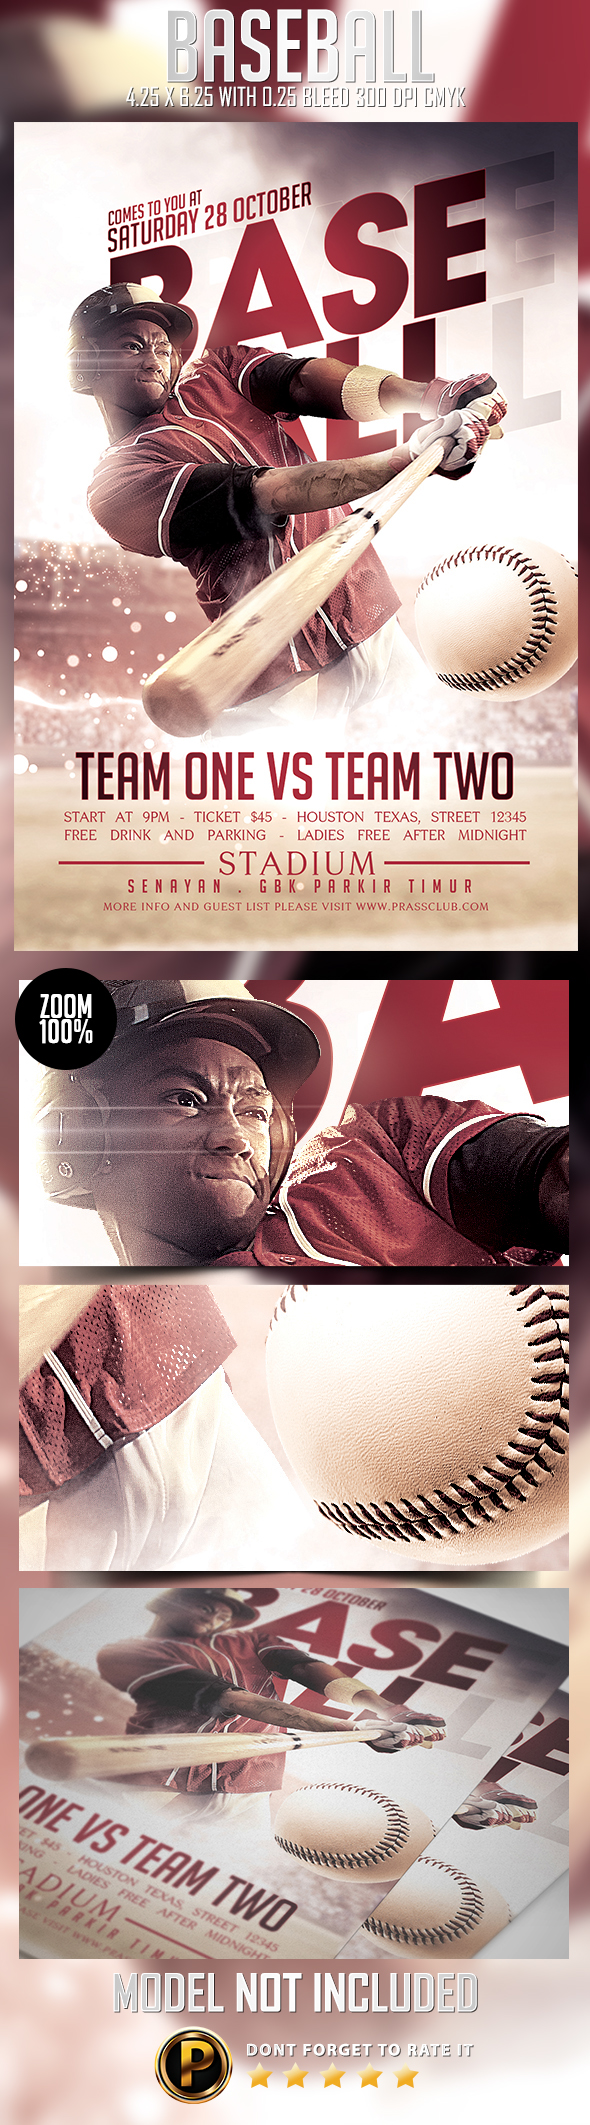 baseball flyer template on behance